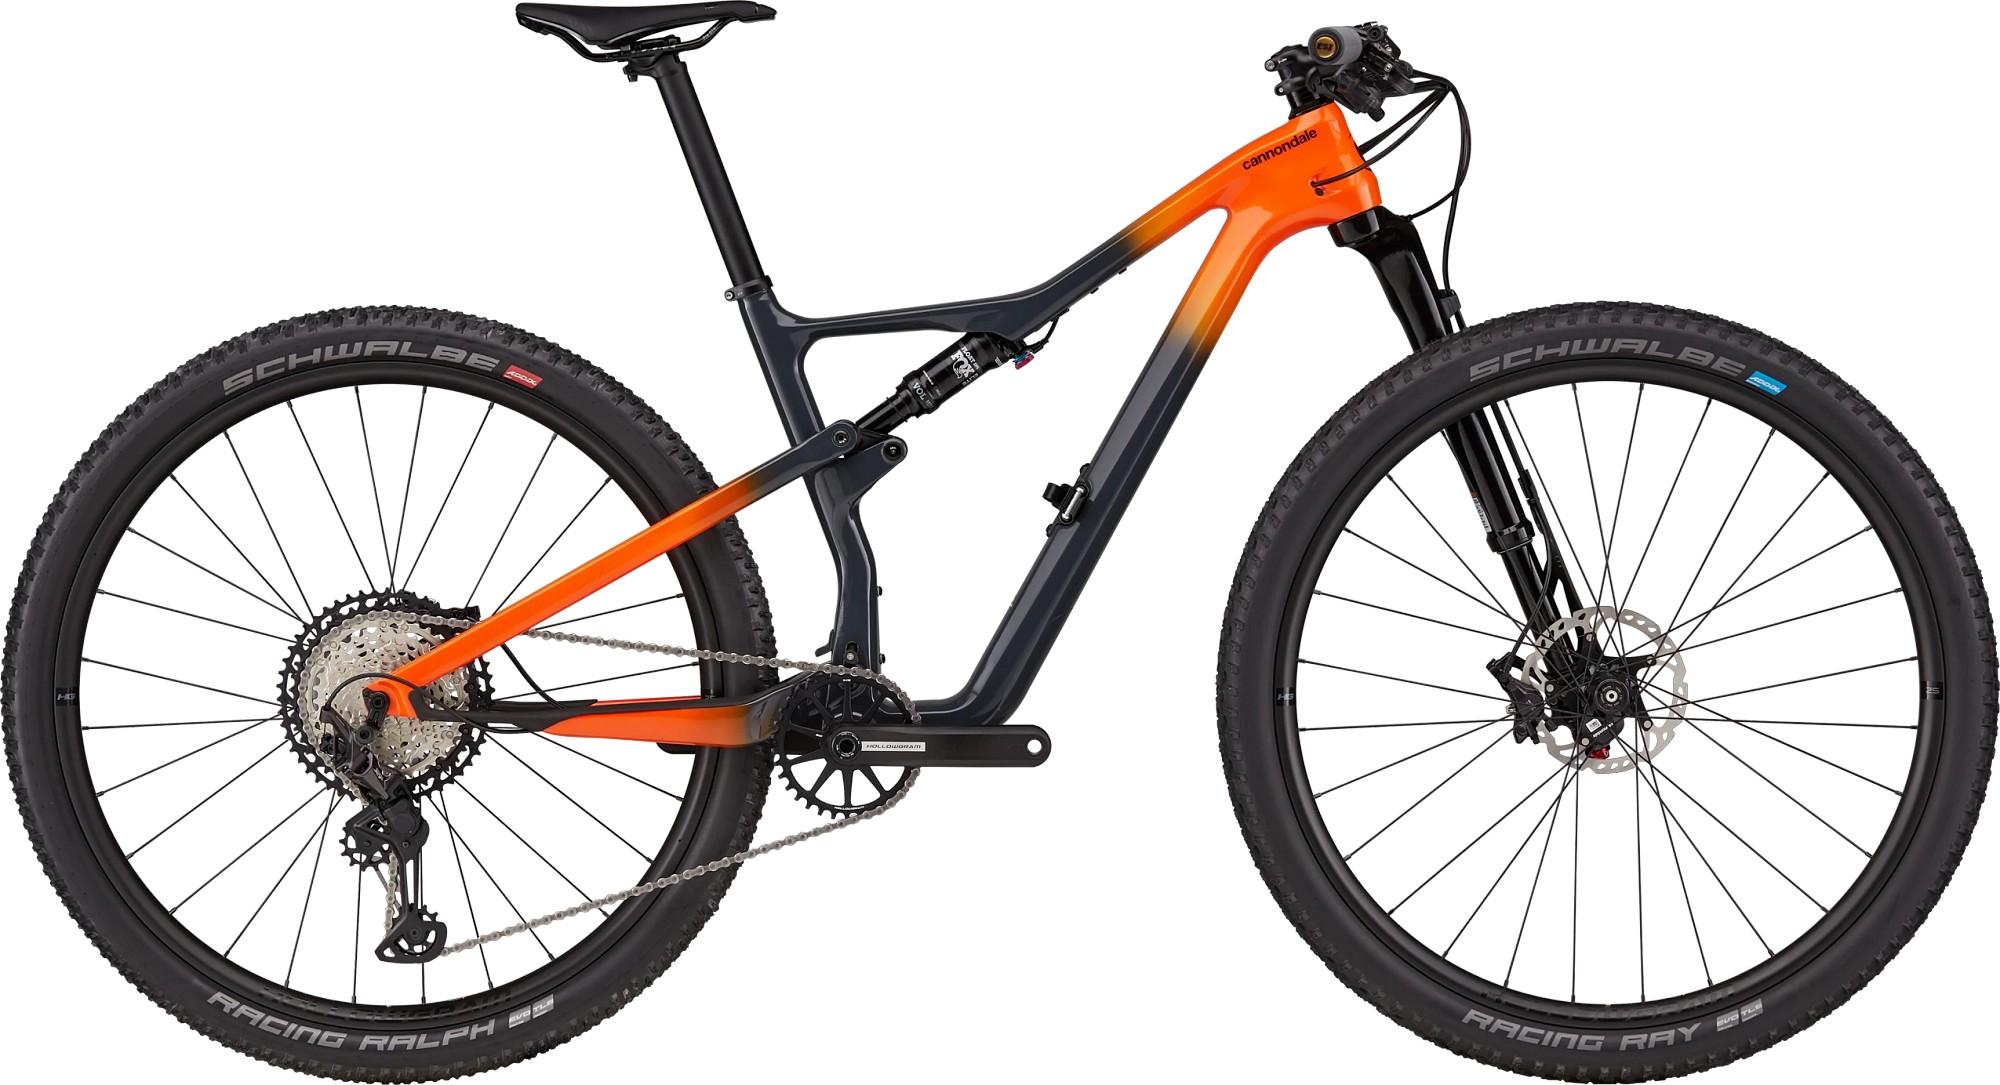 Bicicleta de munte full-suspension Cannondale Scalpel Carbon 2 Negru/Portocaliu 2021 imagine